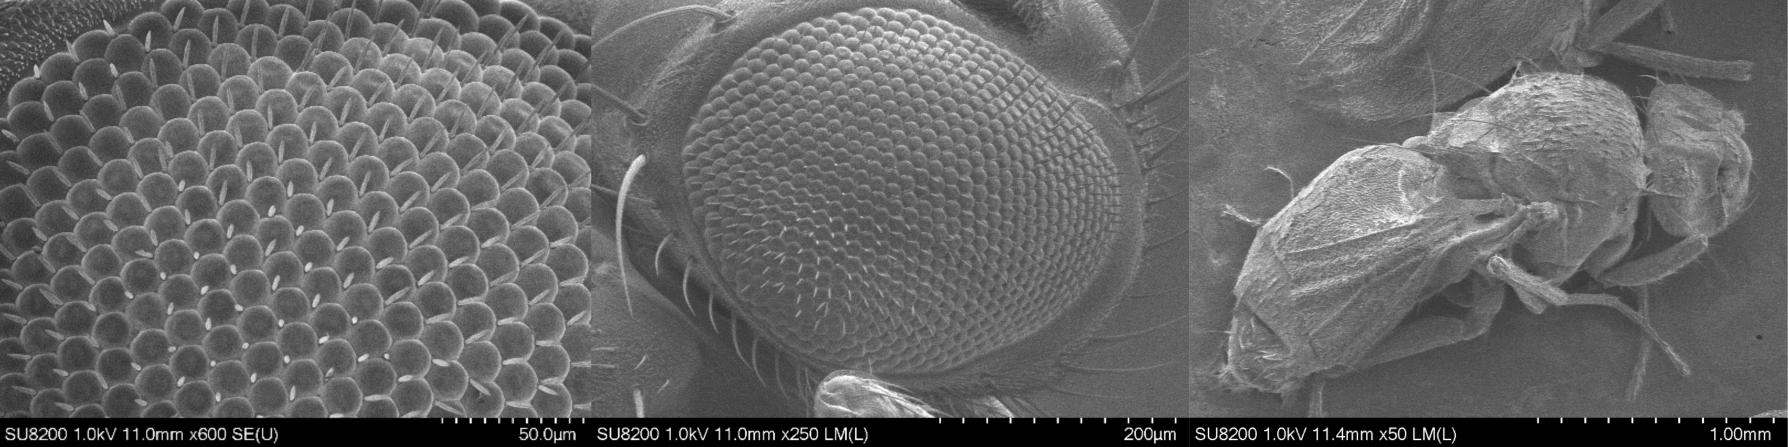 Hitachi SU8230 Scanning Electron Microscope